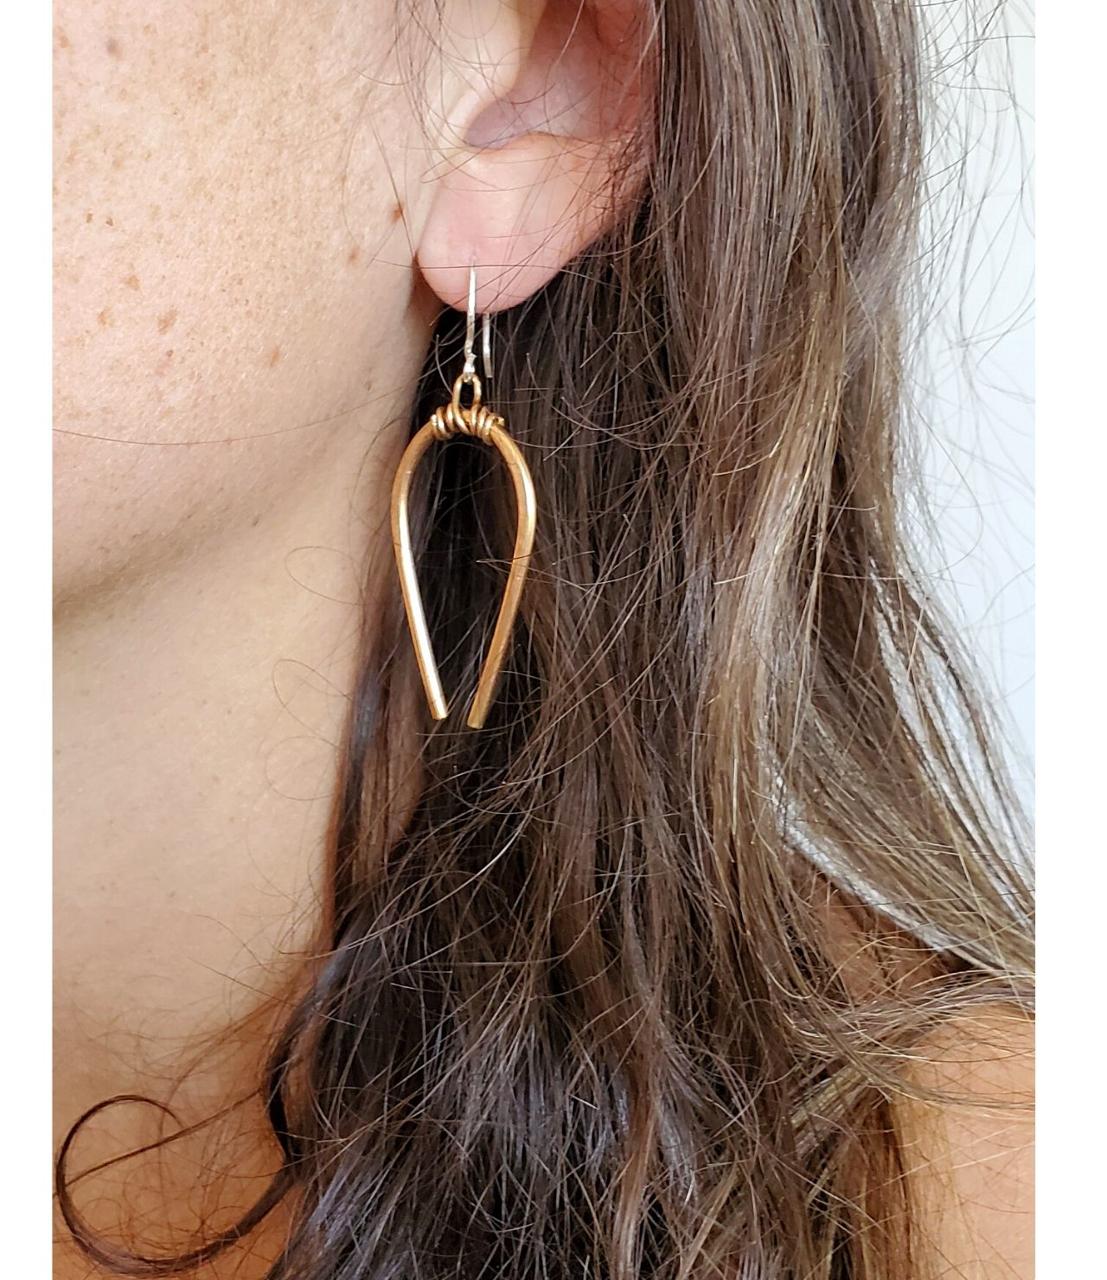 wearing  Casual Bronze Horseshoe earrings on white distressed trunk